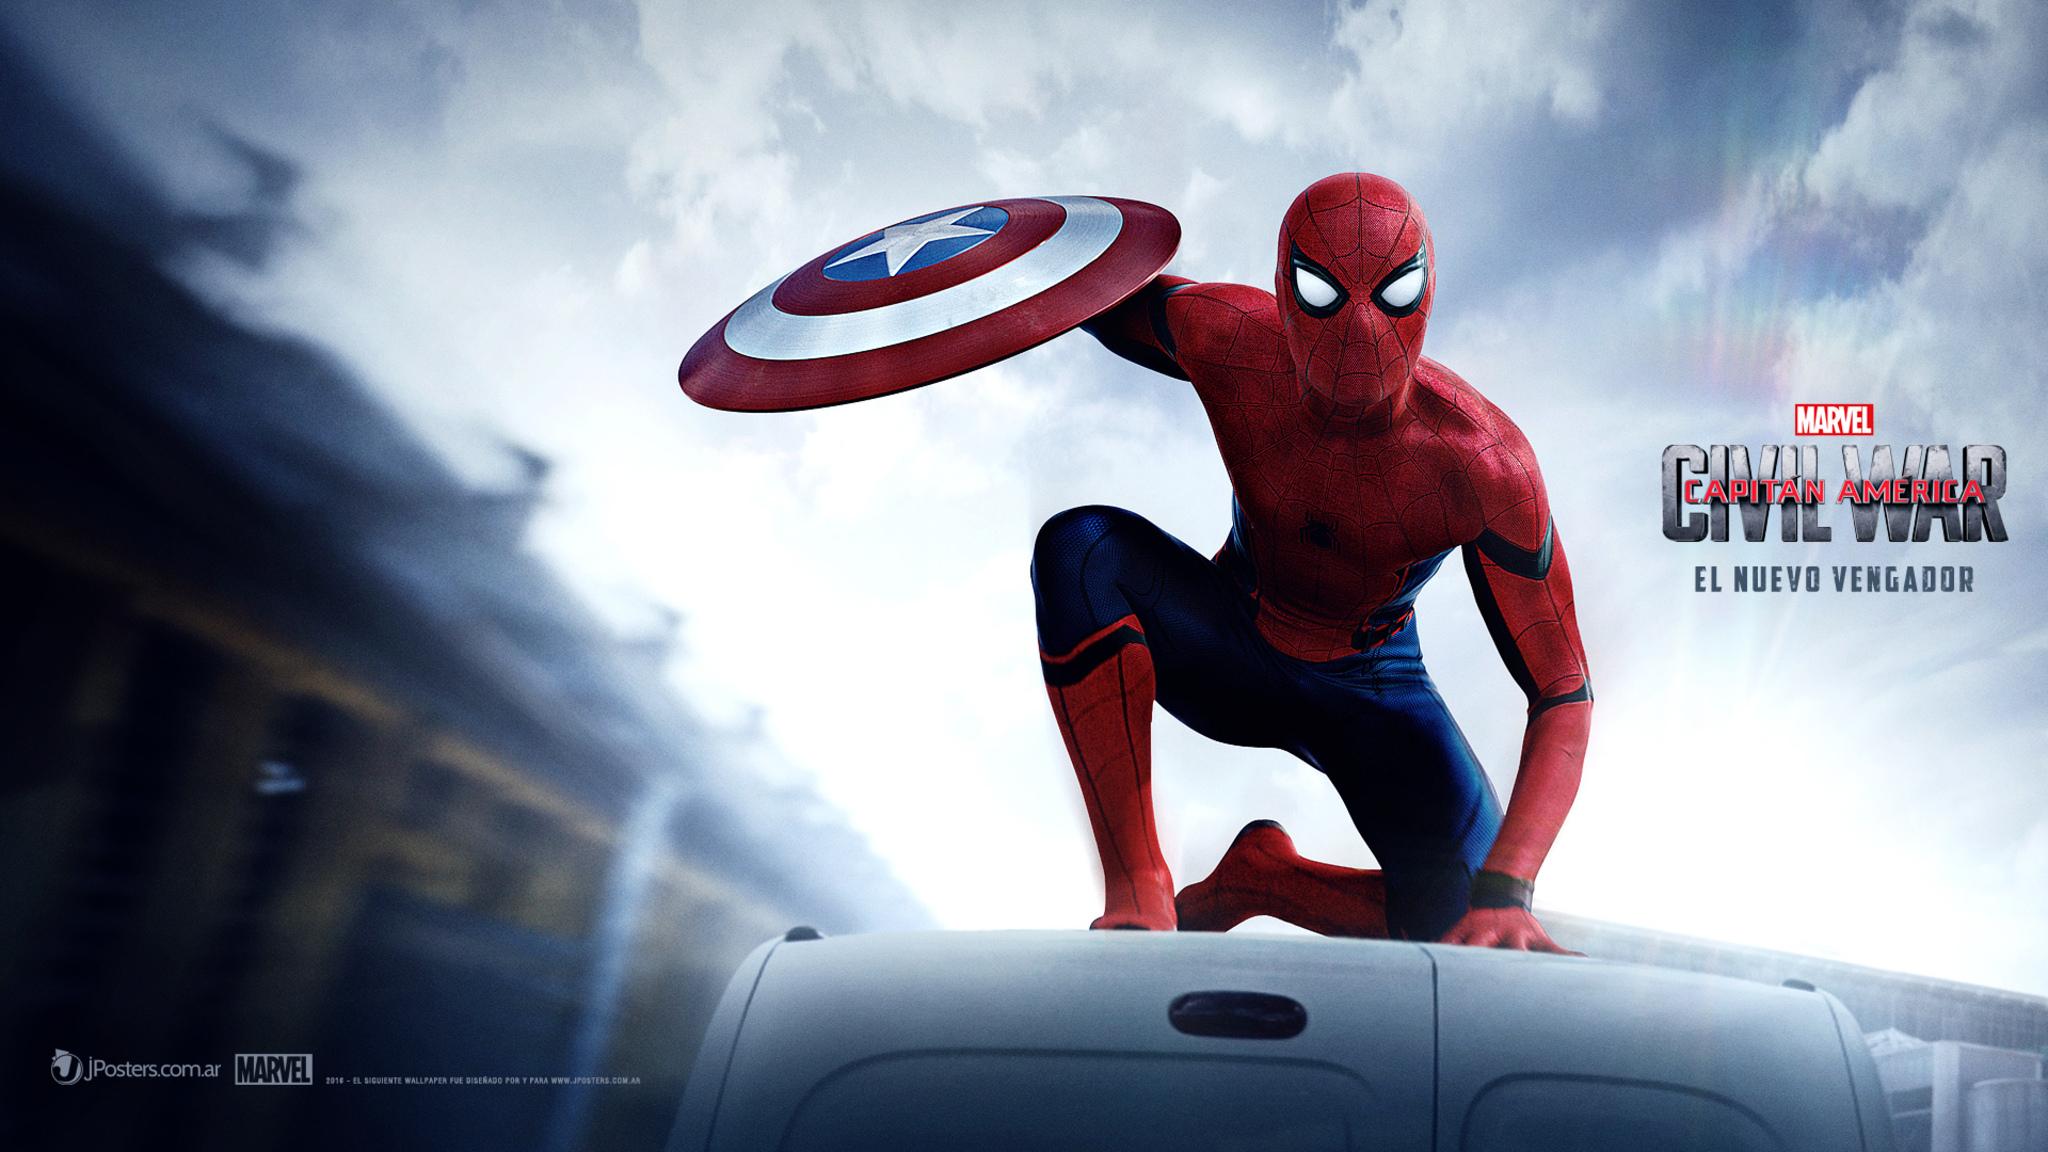 Captain America Civil War 4k: 2048x1152 Spiderman Captain America Civil War 2048x1152